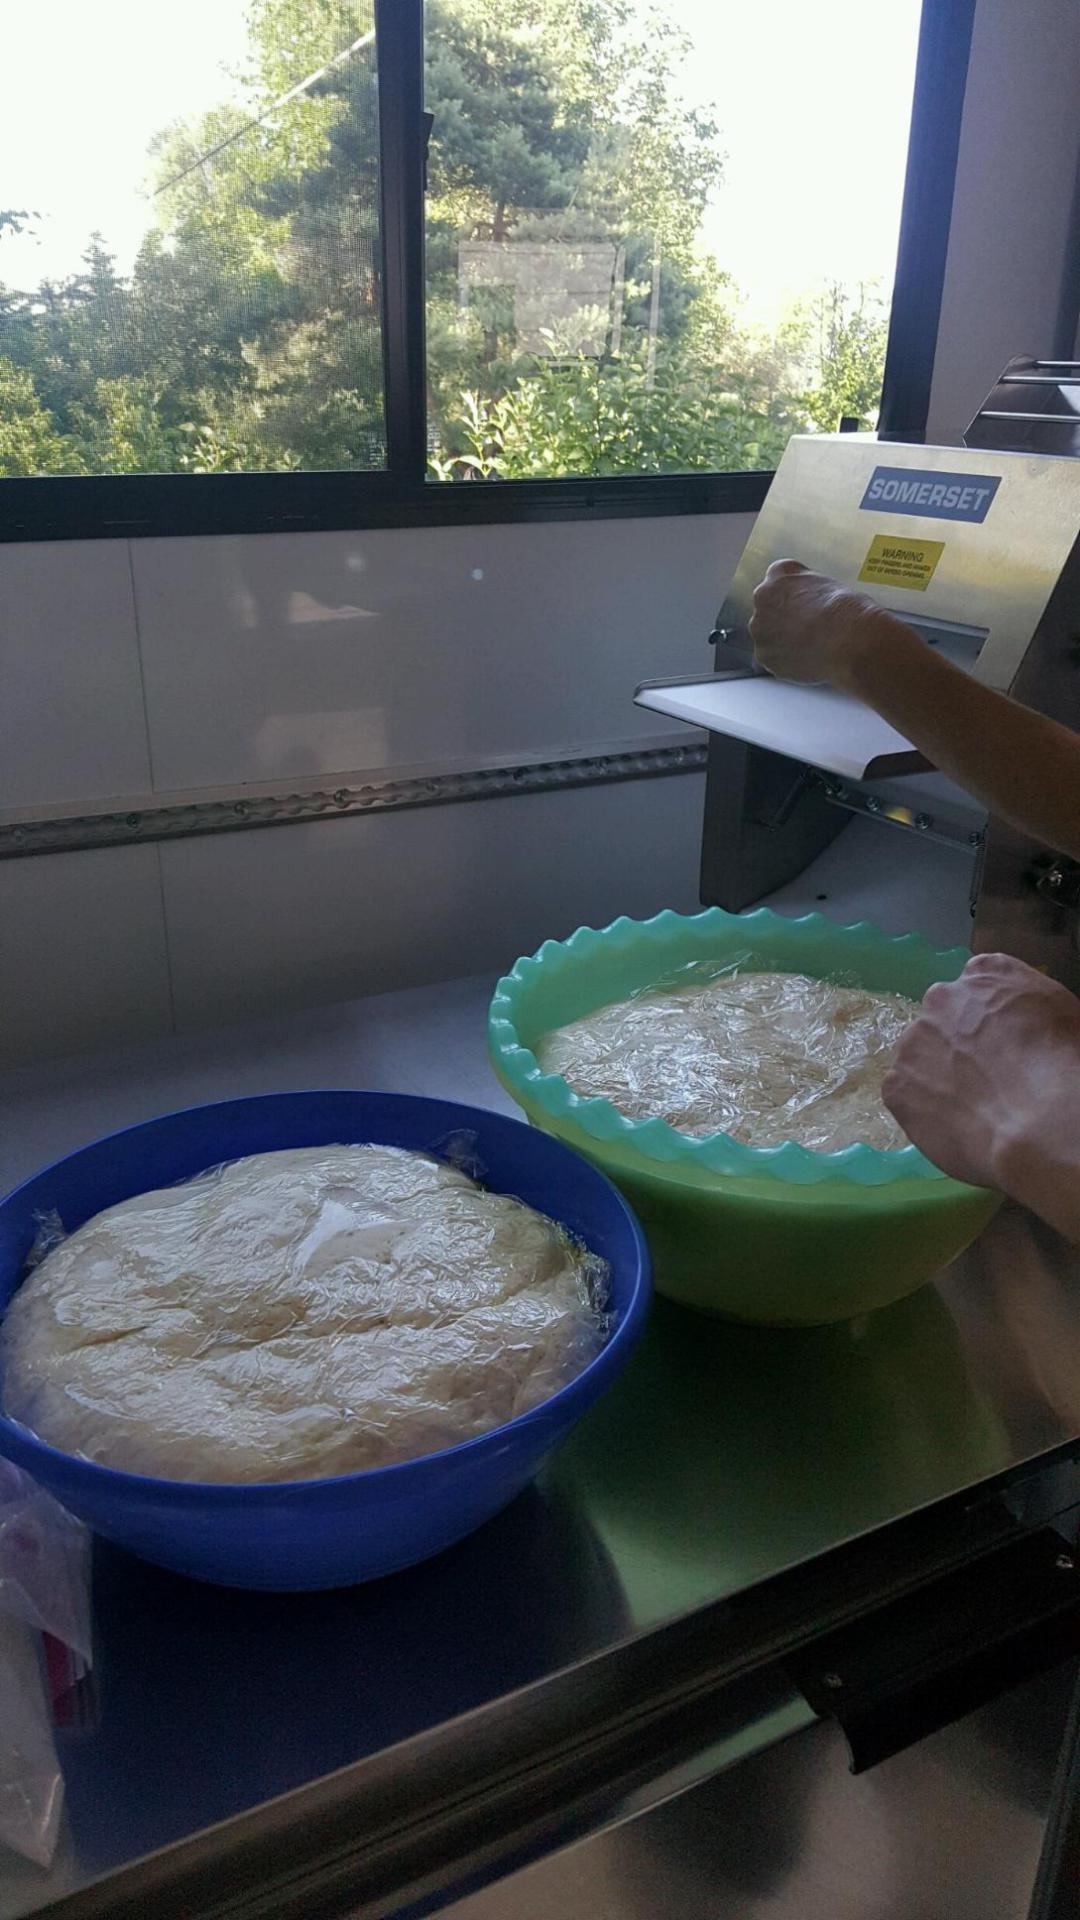 The dough rising.